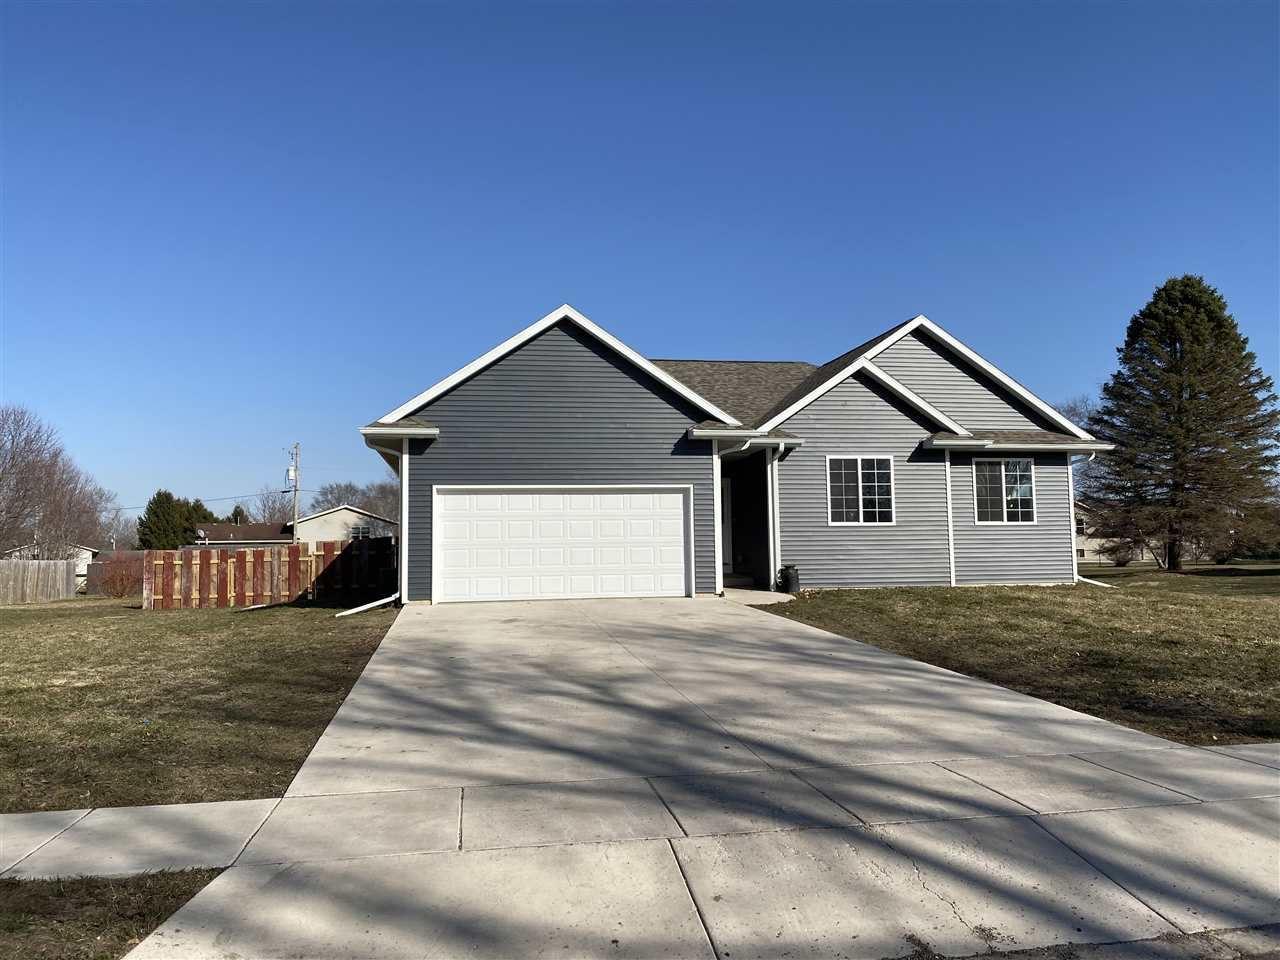 f_1904688 Real Estate in 53508 zip code